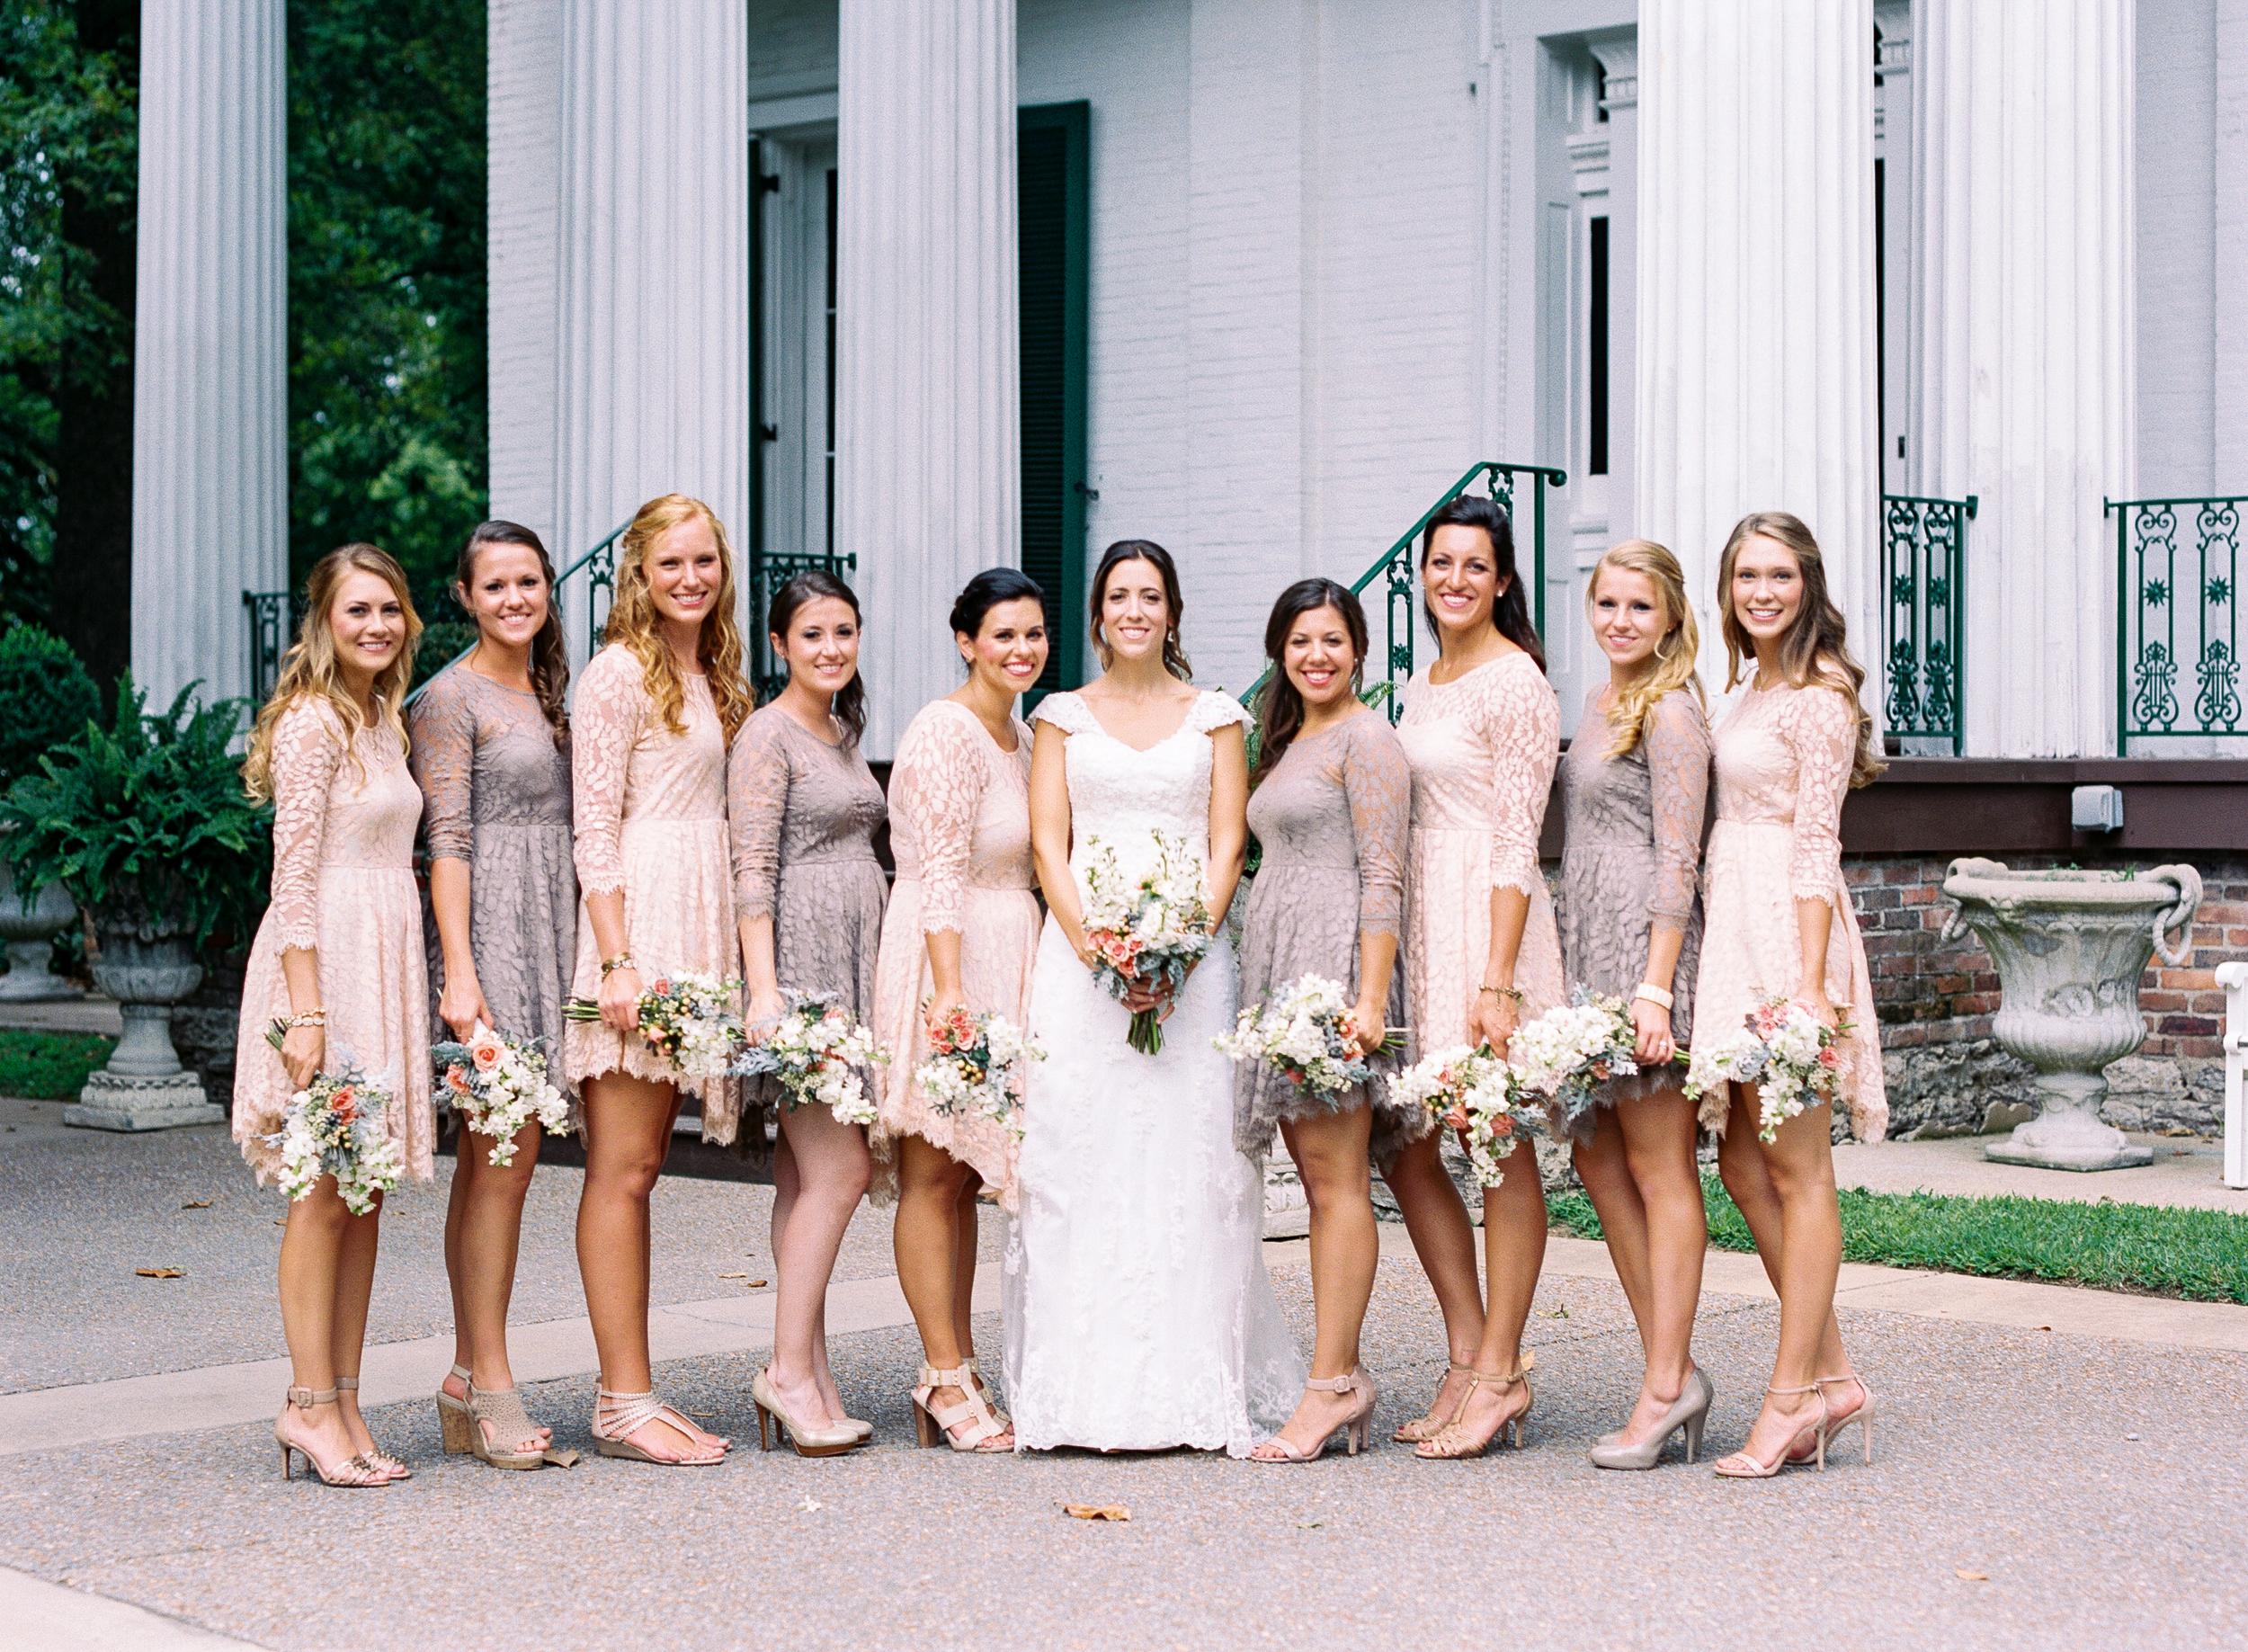 Riverwood Mansion // Bride and Bridesmaids